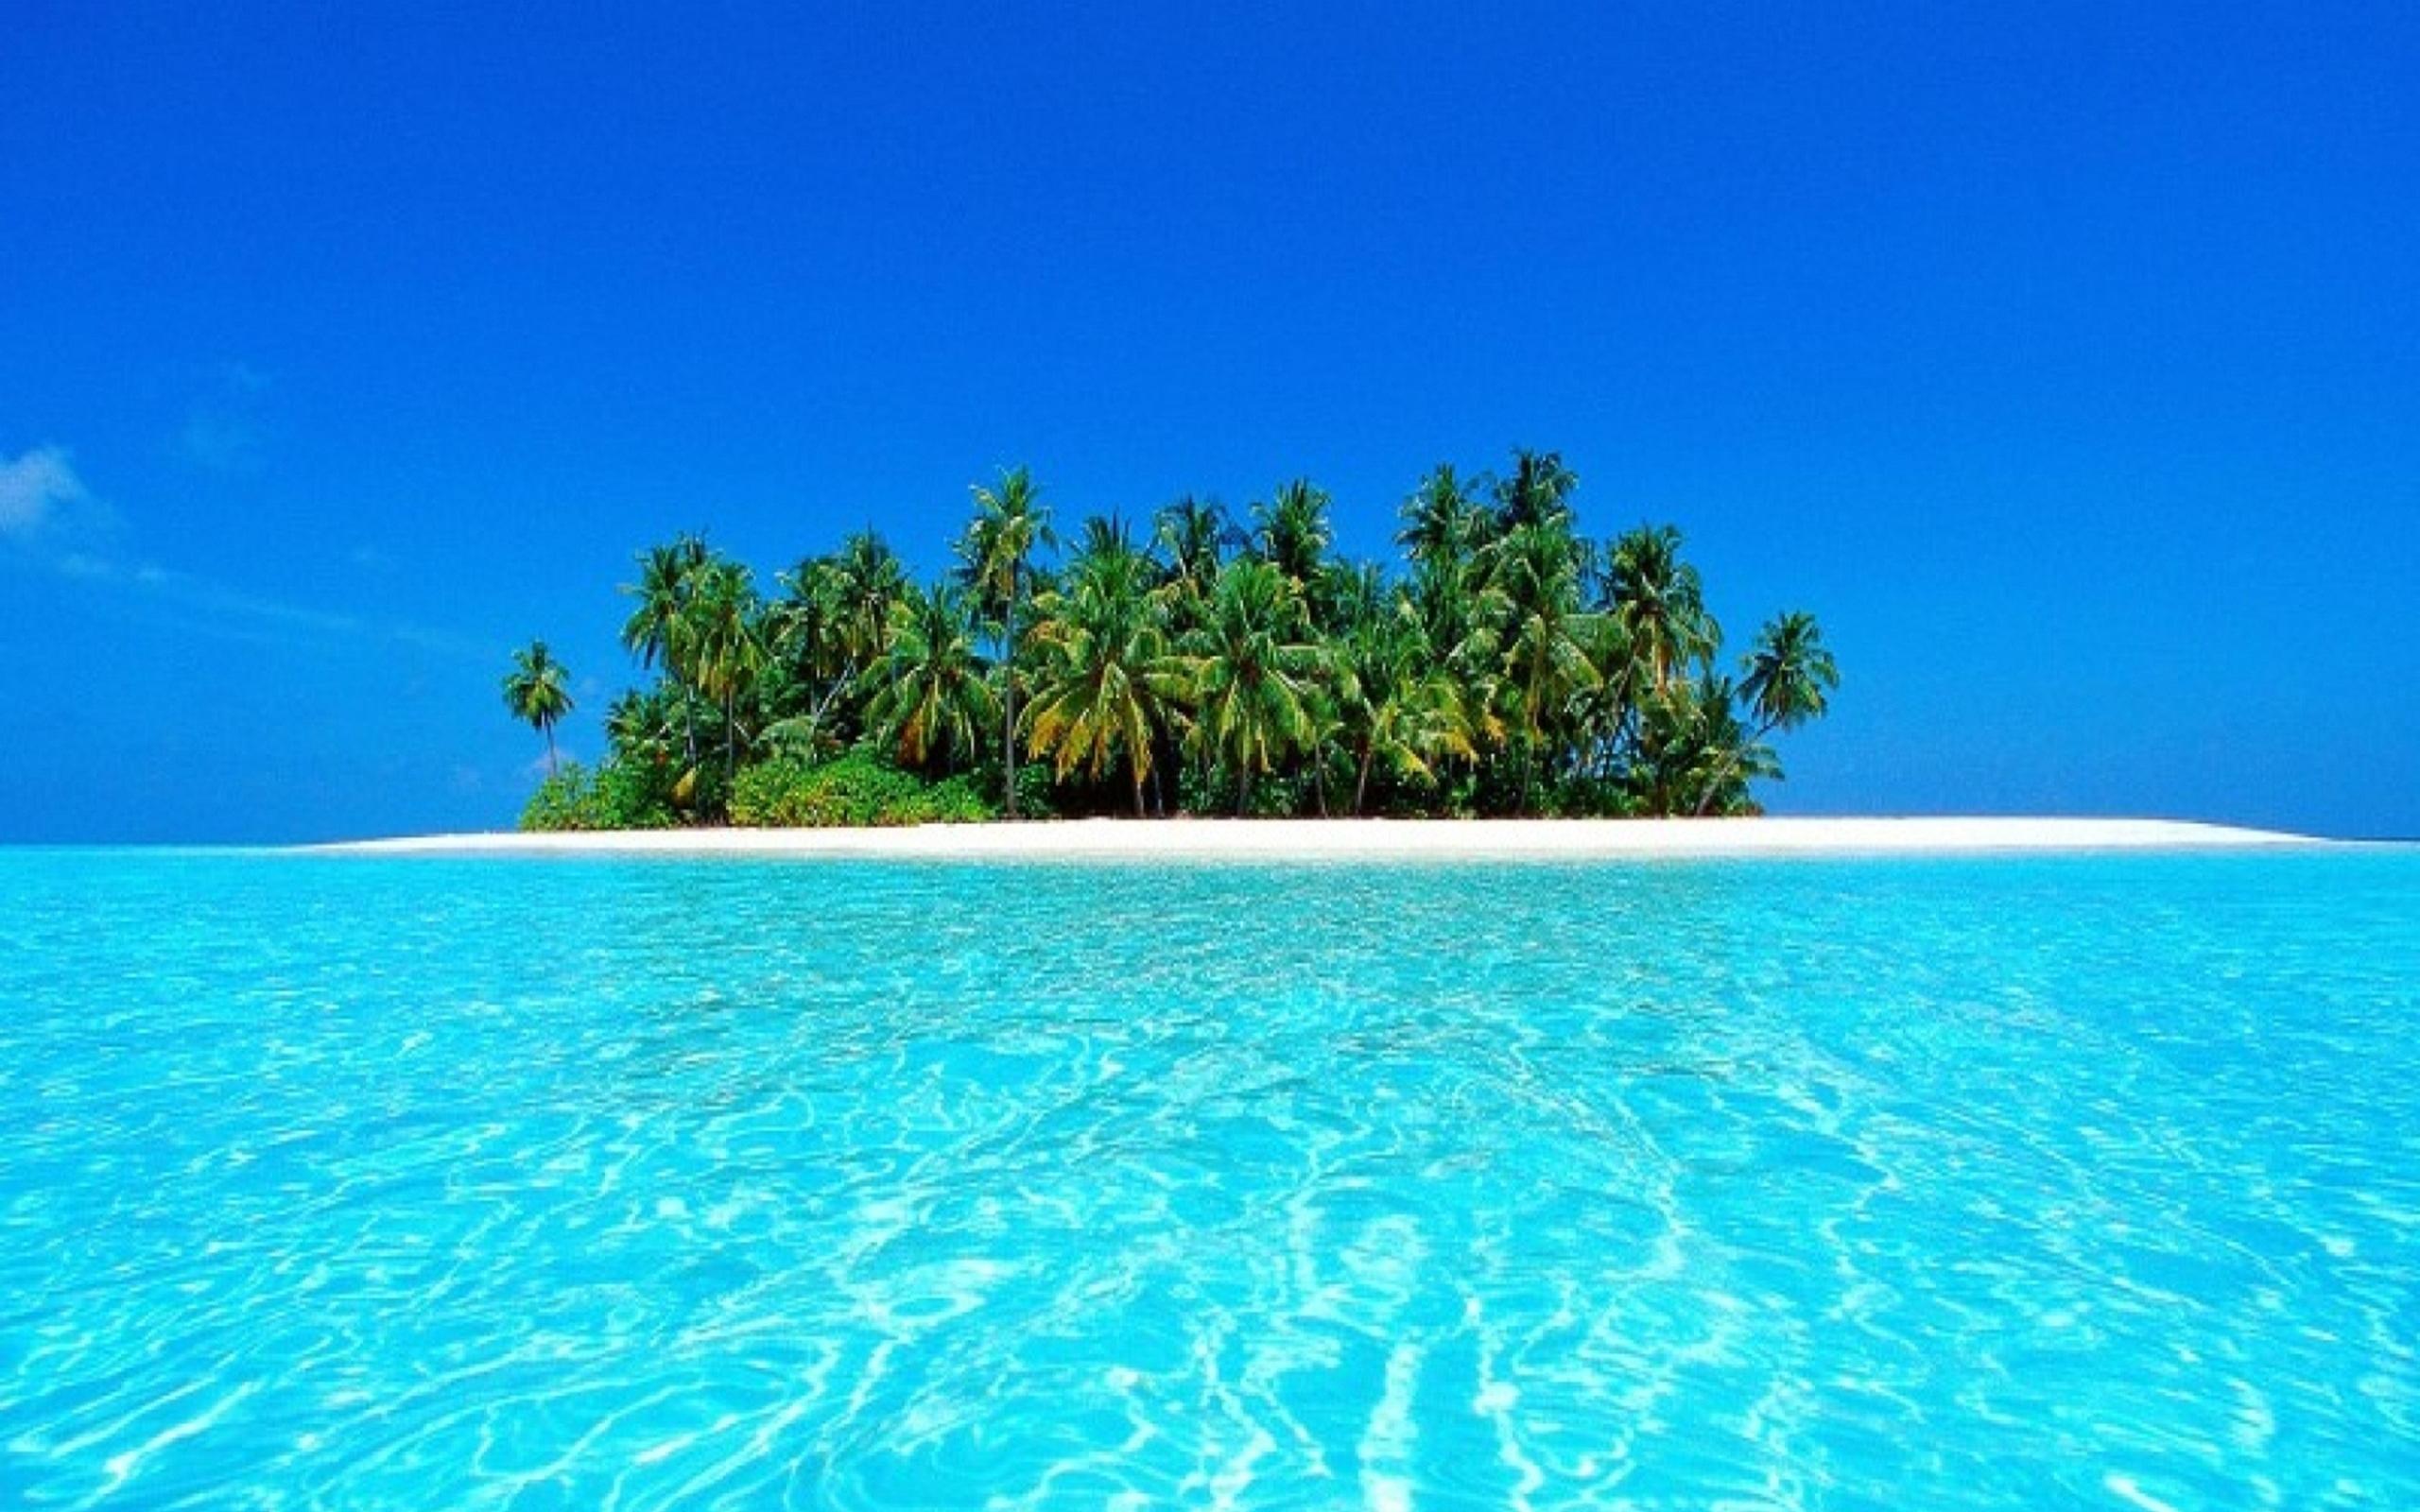 Papel-de-Parede-praia-de-cancun-36223